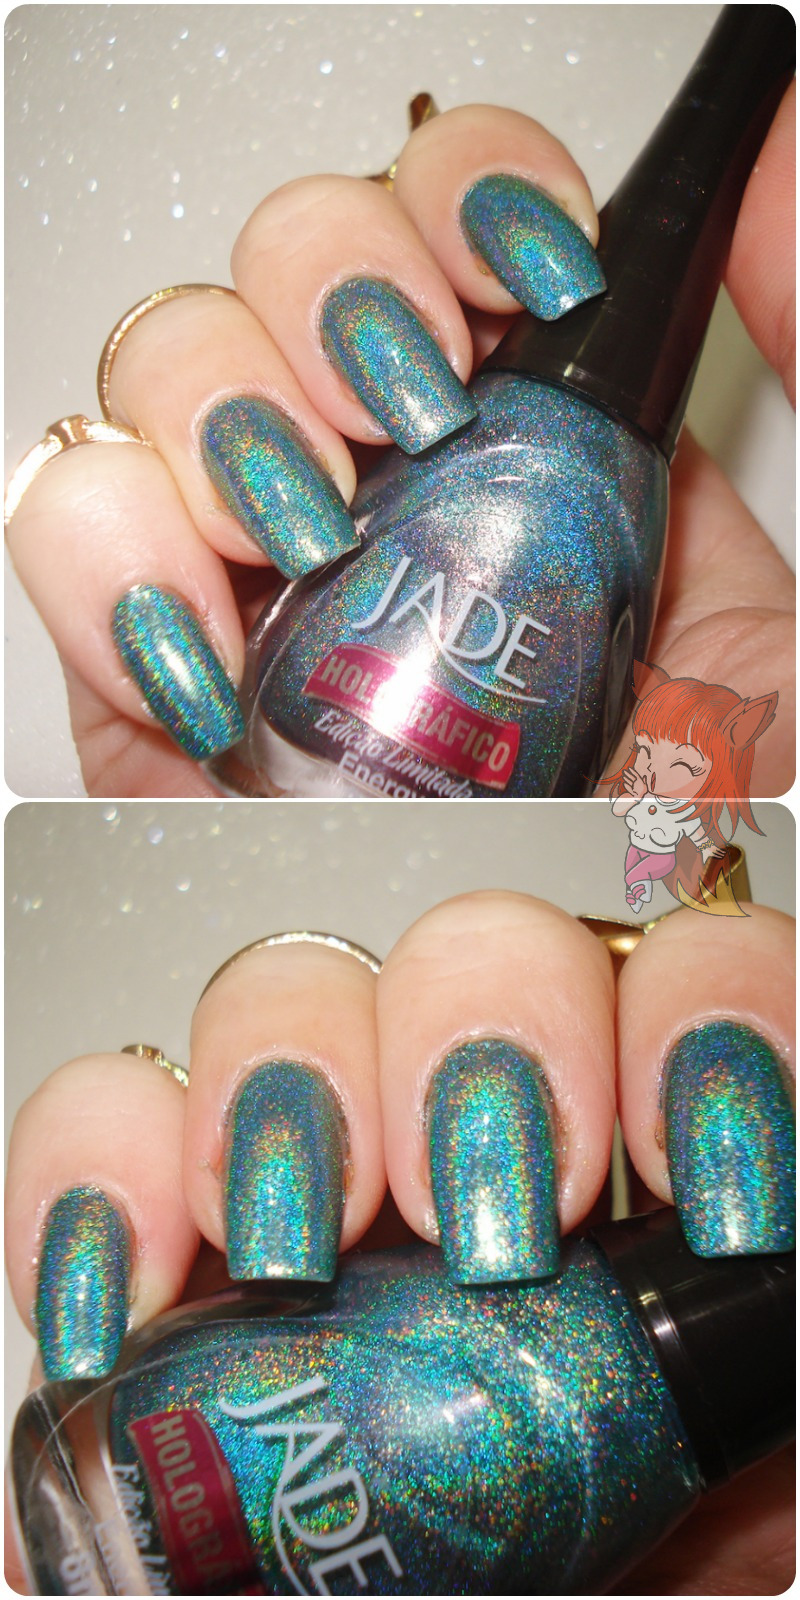 Esmalte Jade :: Energy - Resenha #12Meses12Esmaltes